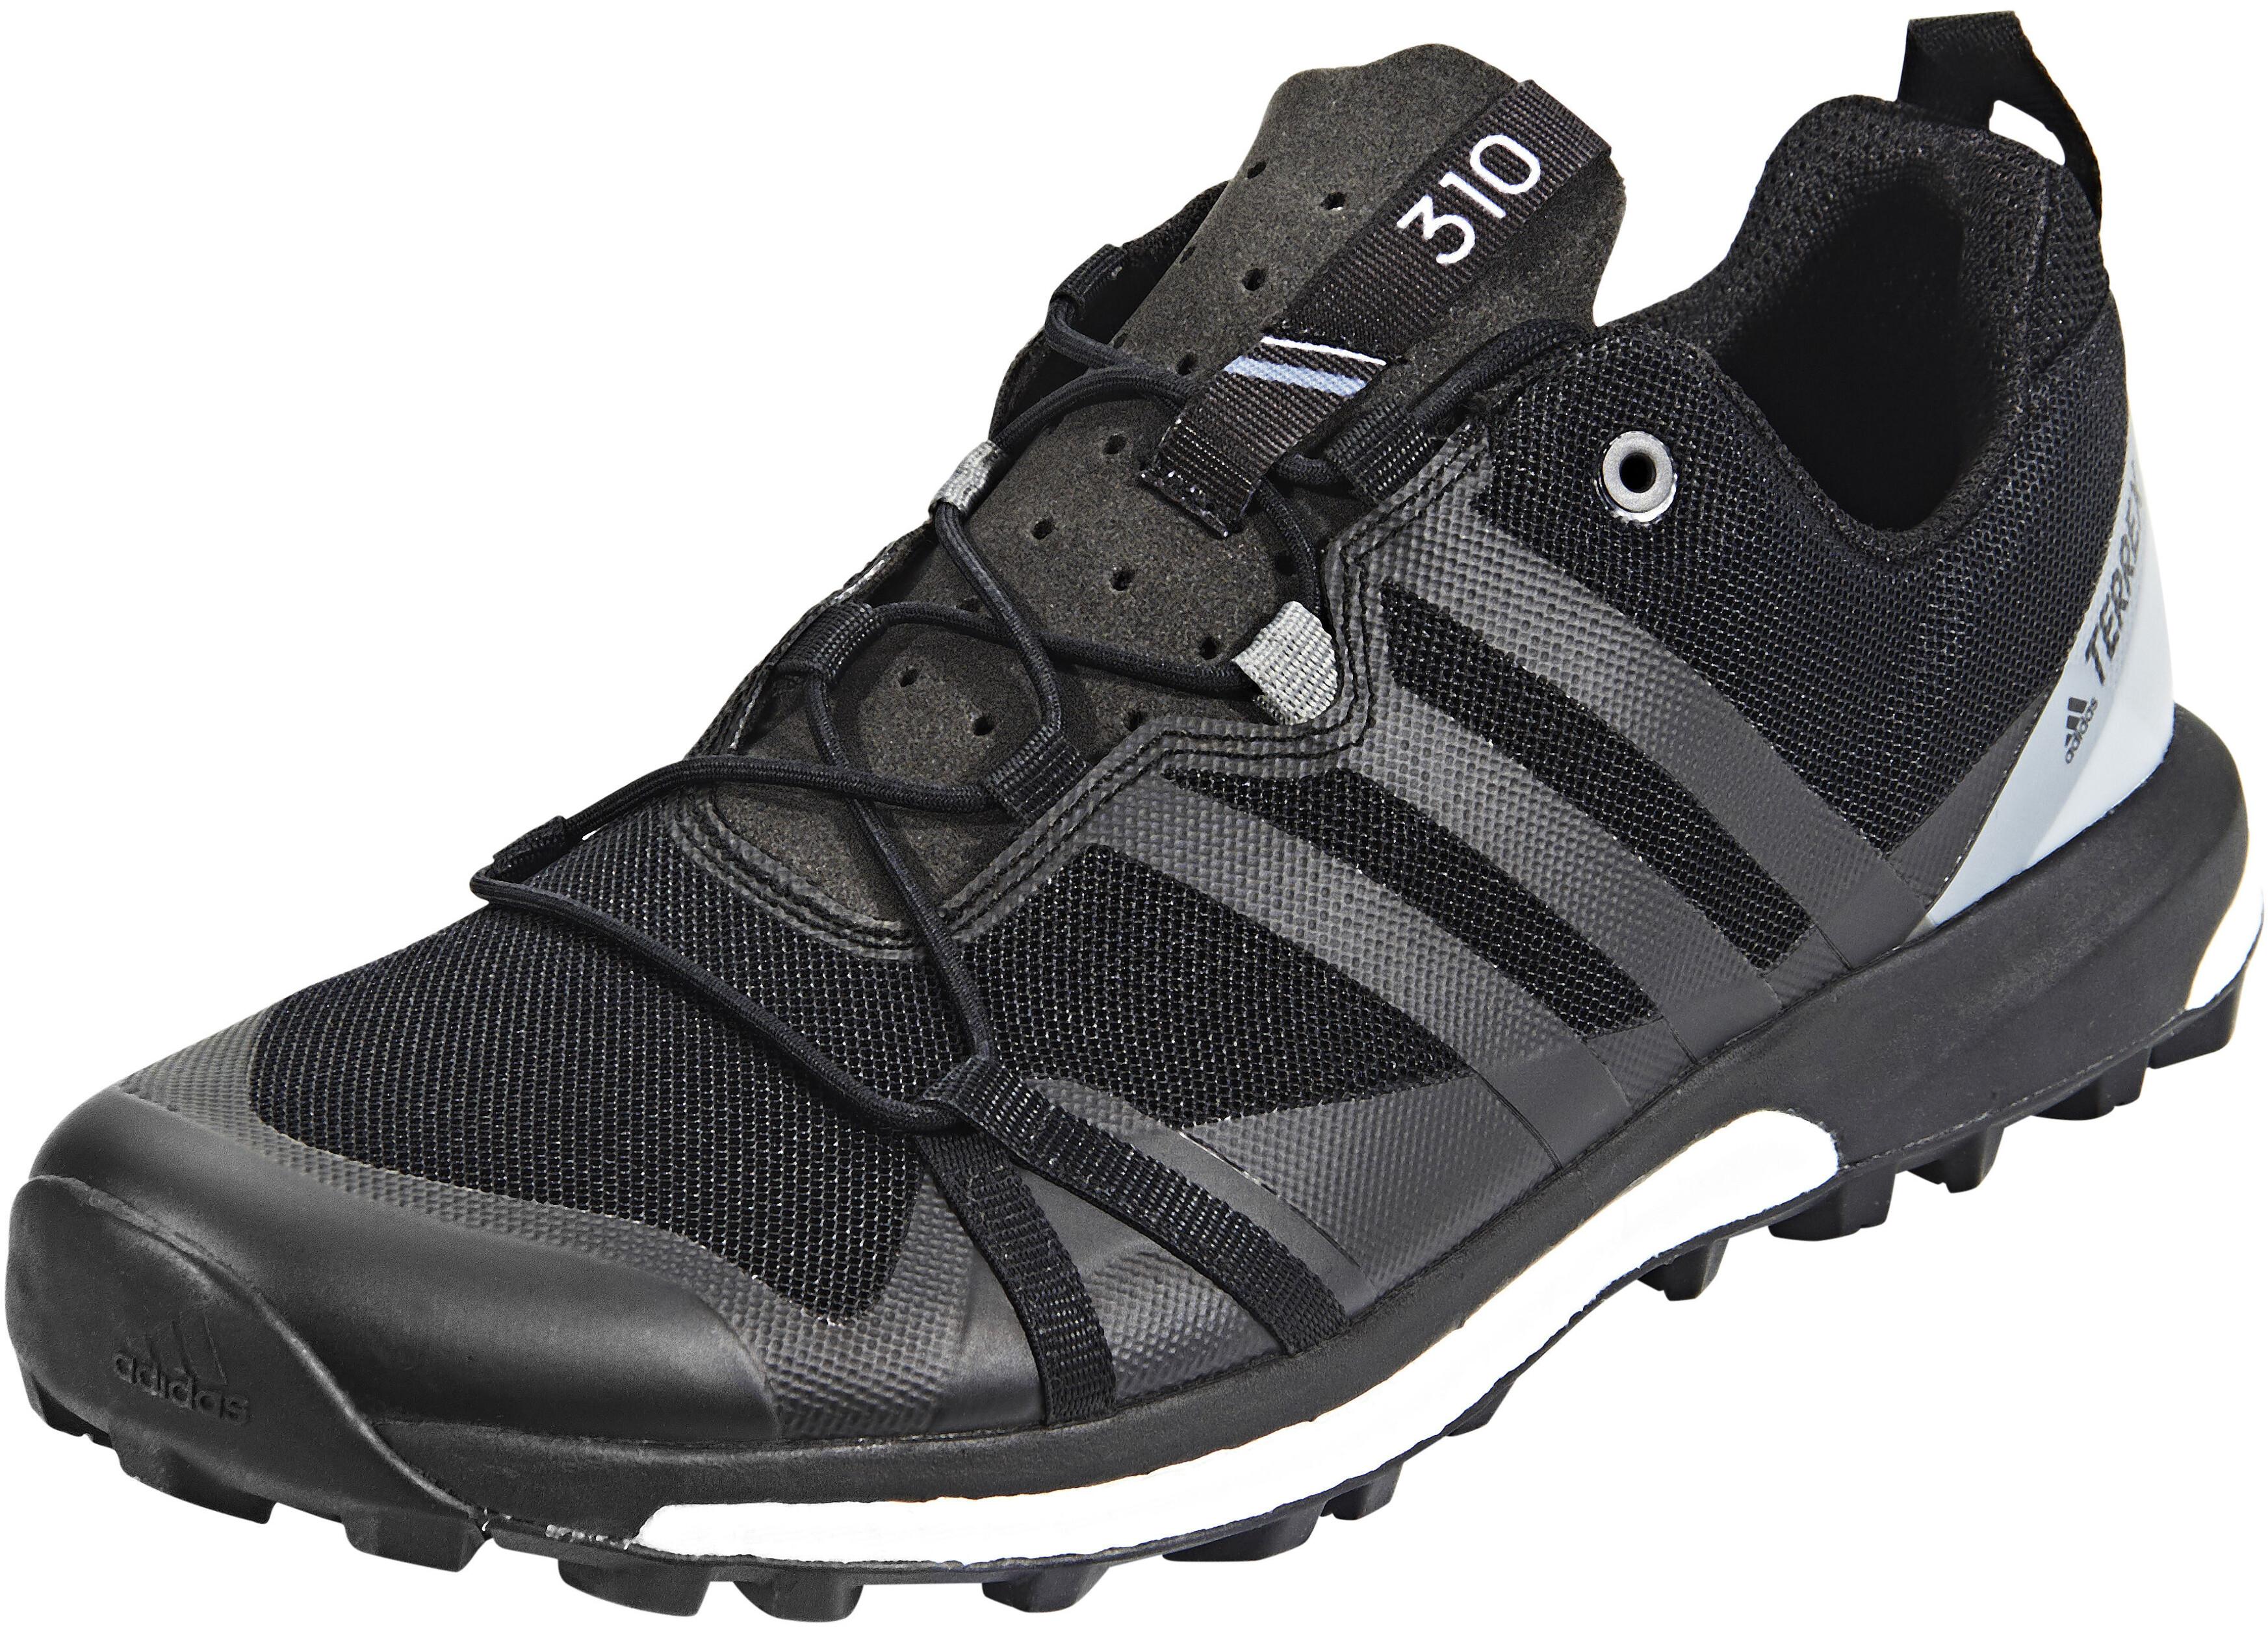 b4b142805f1 adidas TERREX Agravic - Zapatillas running Hombre - negro